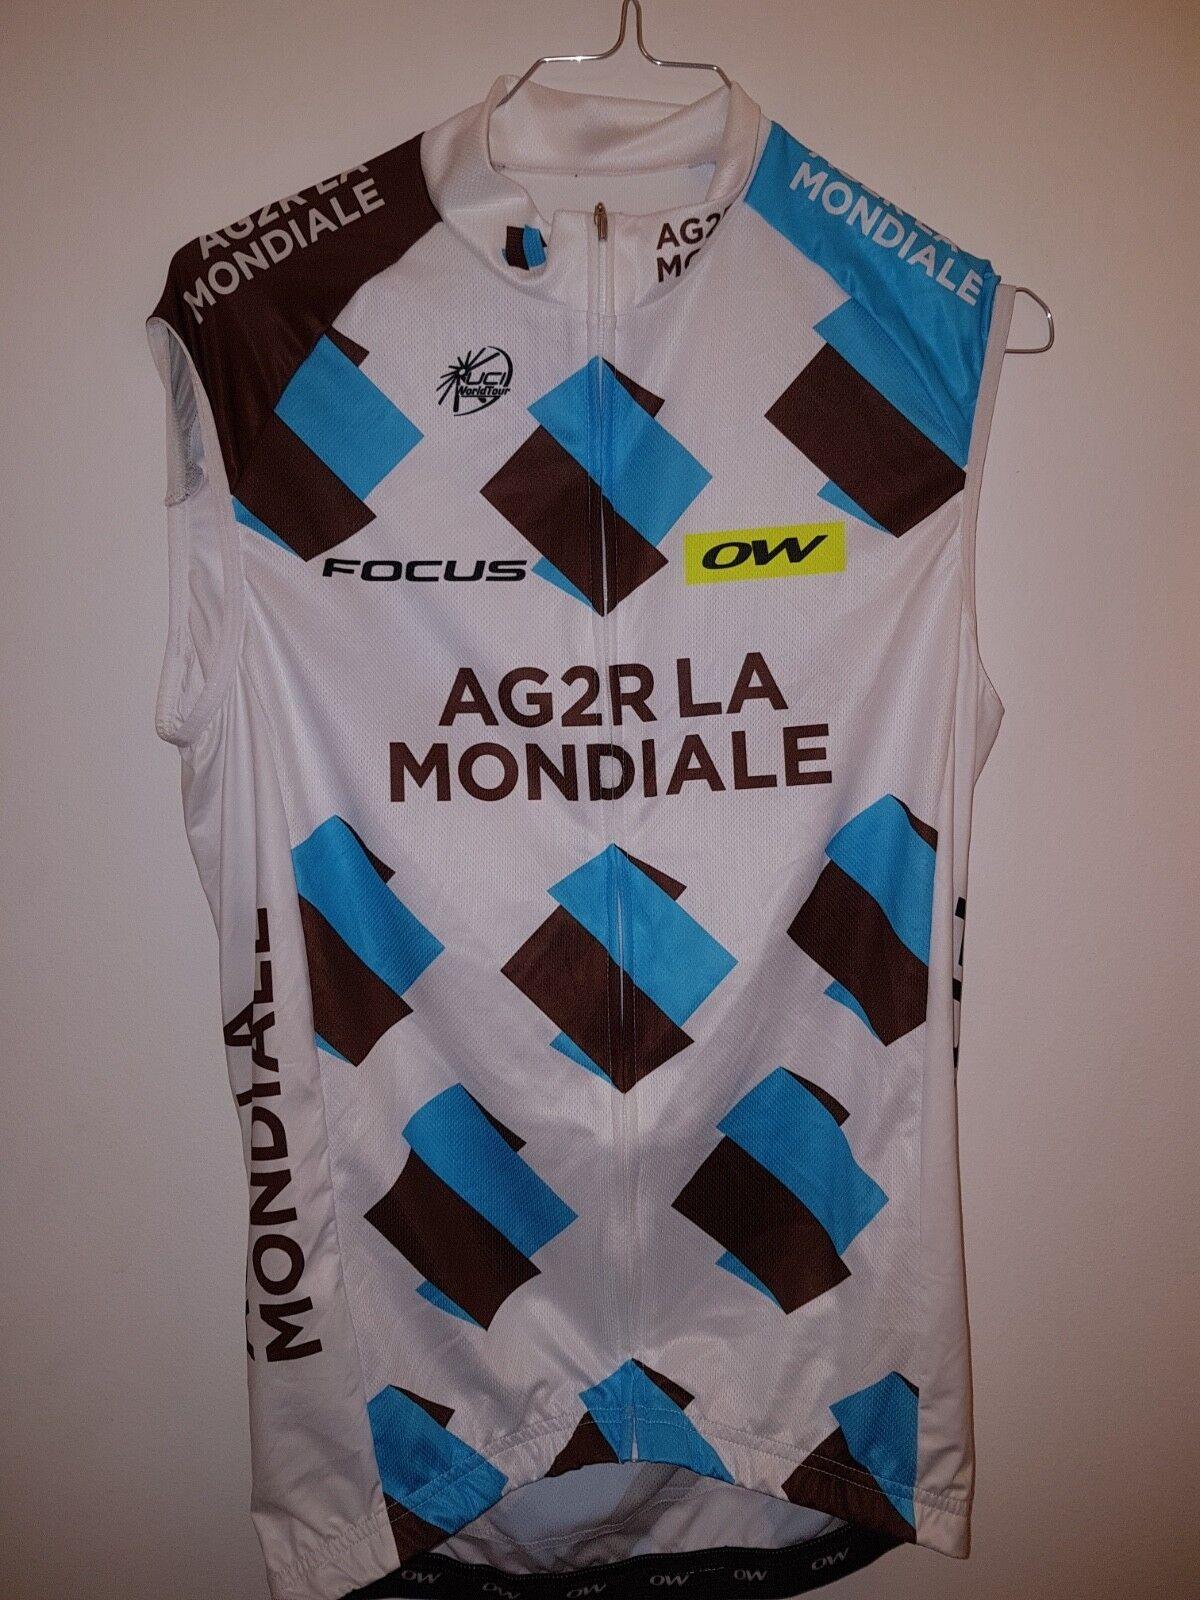 Maillot cycliste vélo SERGENT cyclisme AG2R GIRO cycling jersey radtrikot